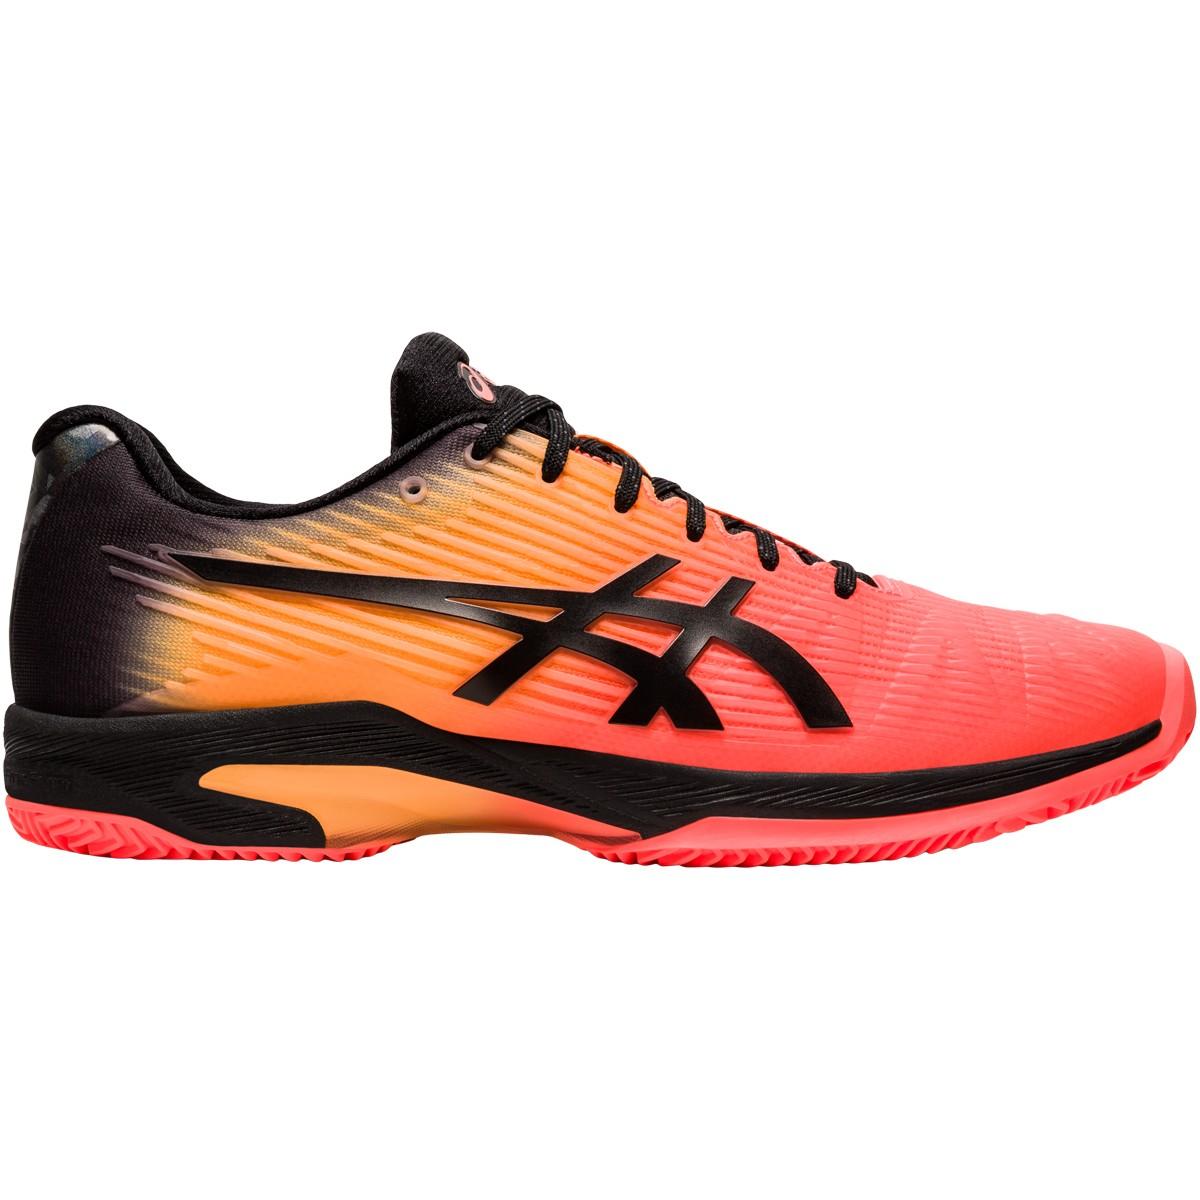 Chaussures asics solution speed ff modern tokyo terre battue